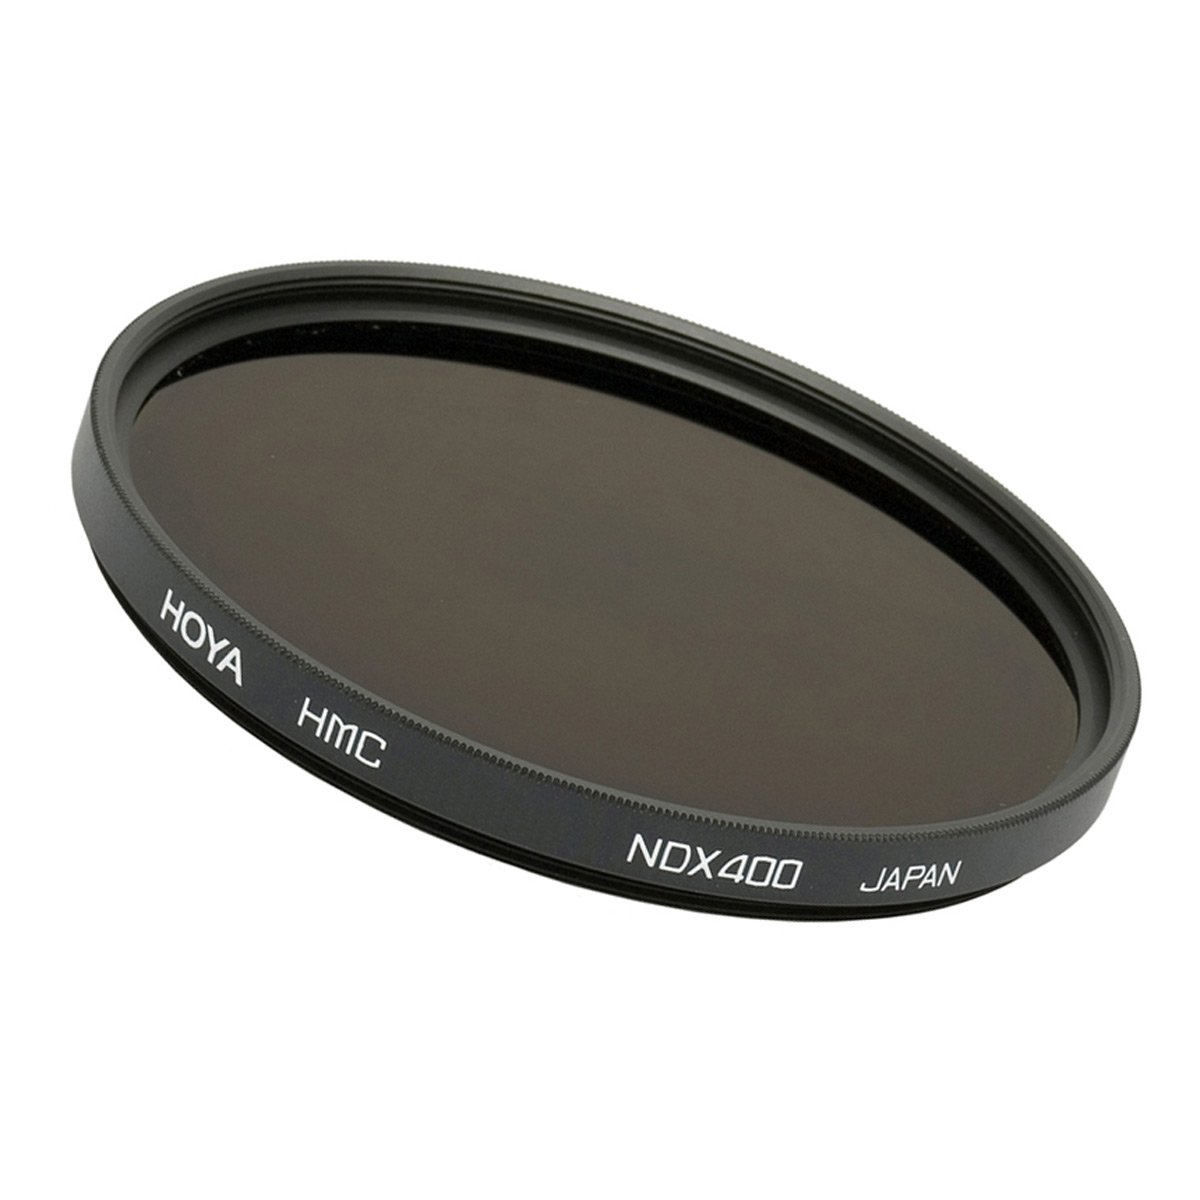 Hoya HMC NDx400 58mm Filter